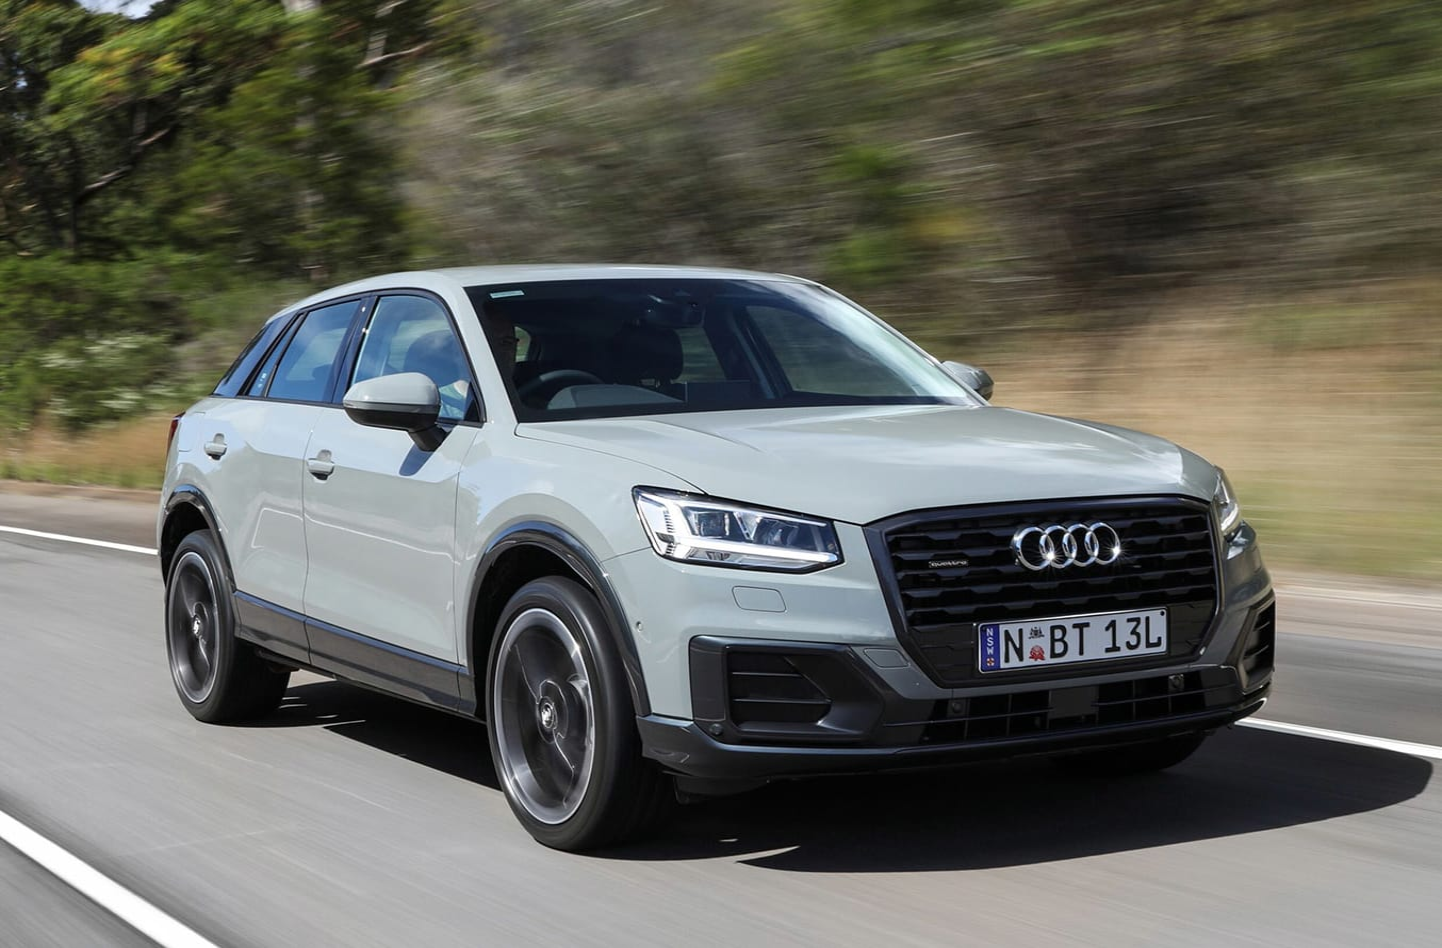 2017 Audi Q2 2.0 TSFI quattro Sport quick review